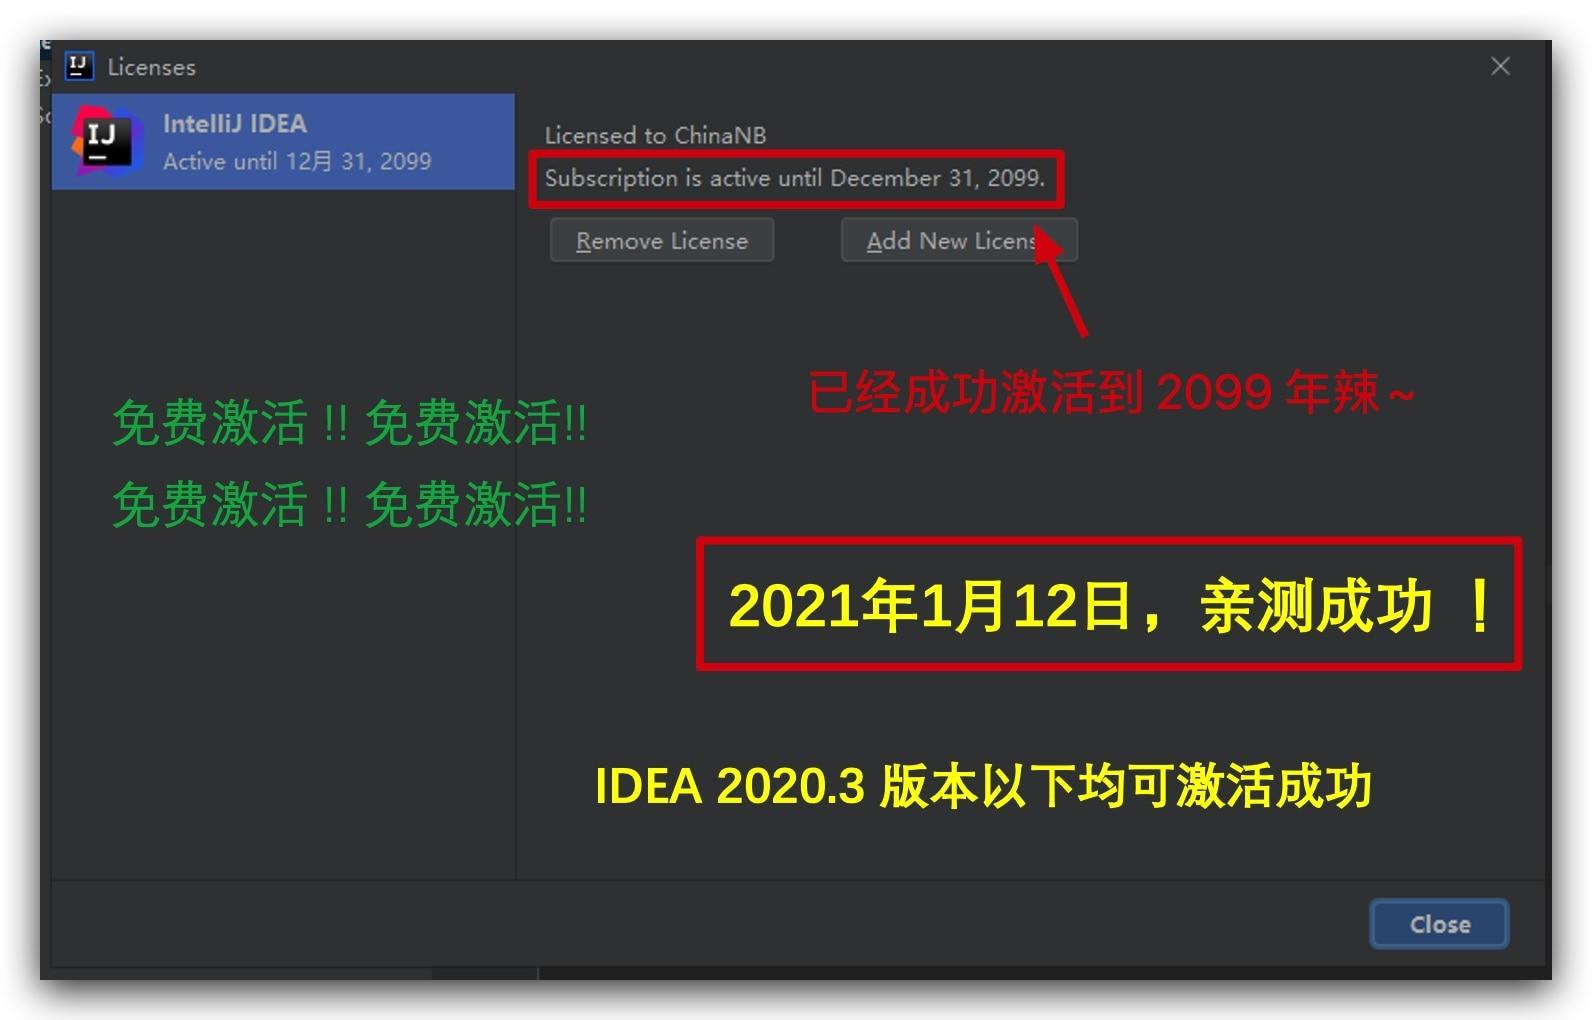 IDEA 2020.3.1版本激活注册成功画面